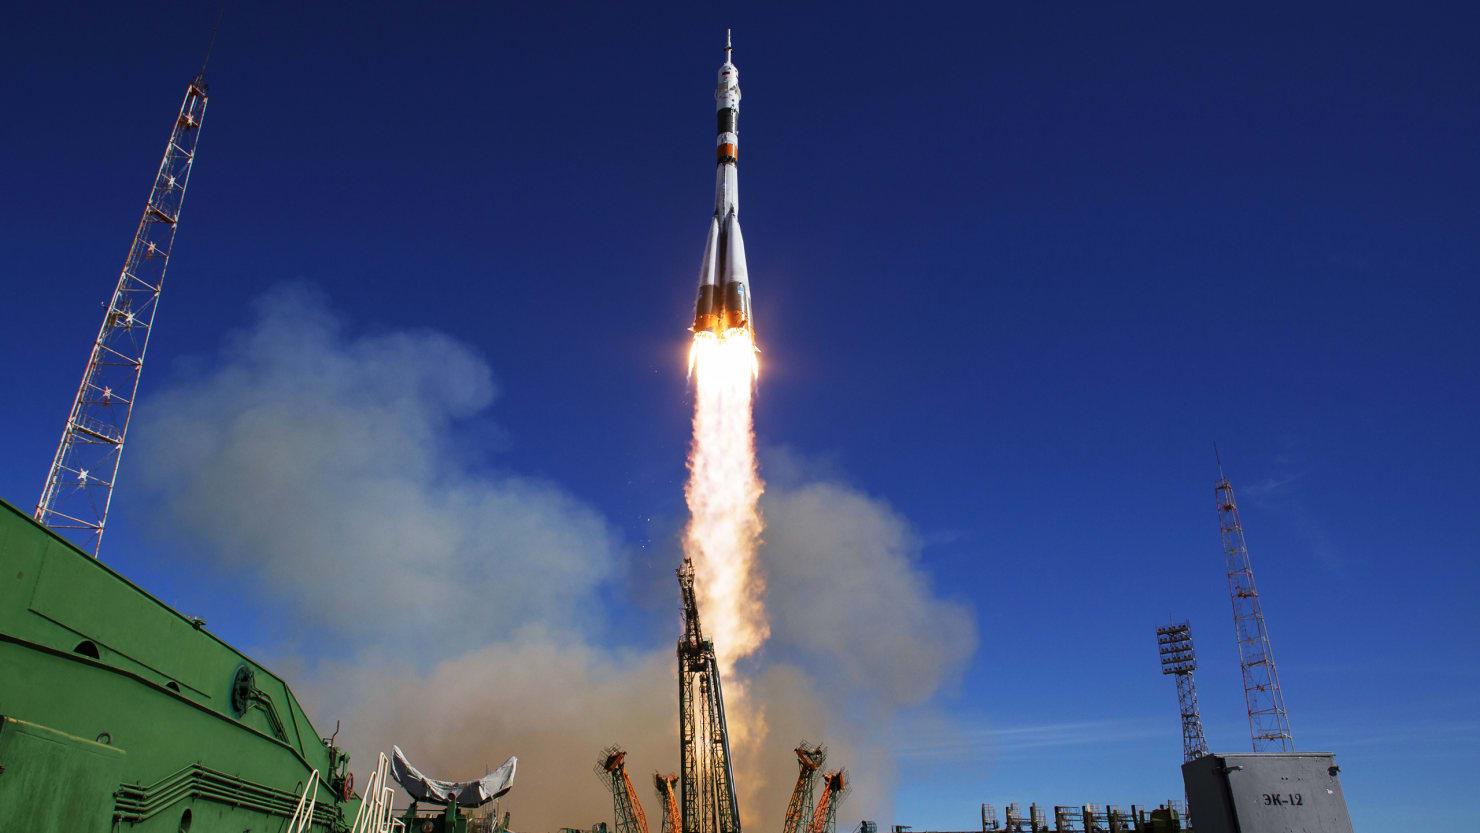 image of soyuz rocket taking off from kazakhstan into sky roscosmos russia united states america nasa